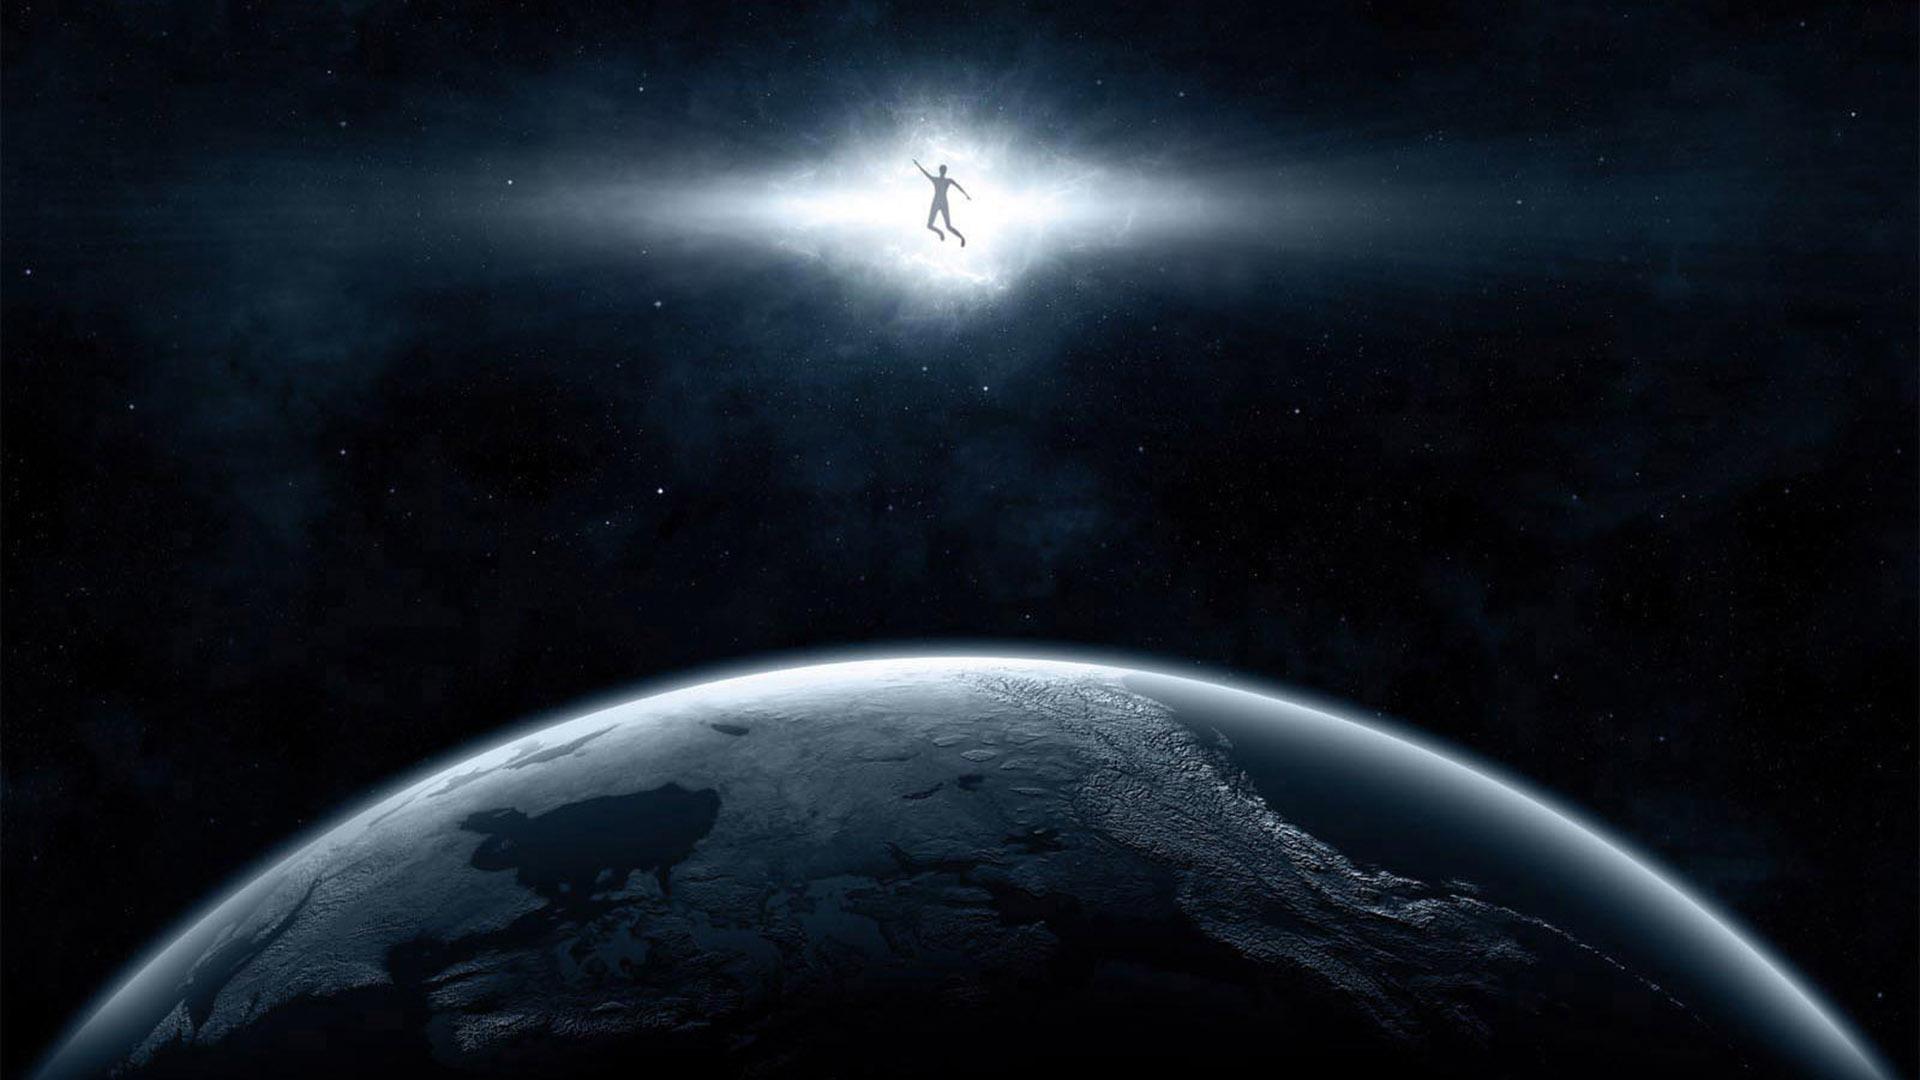 Space Demonic Art Hd Wallpaper: Hd Space Wallpapers 1080p